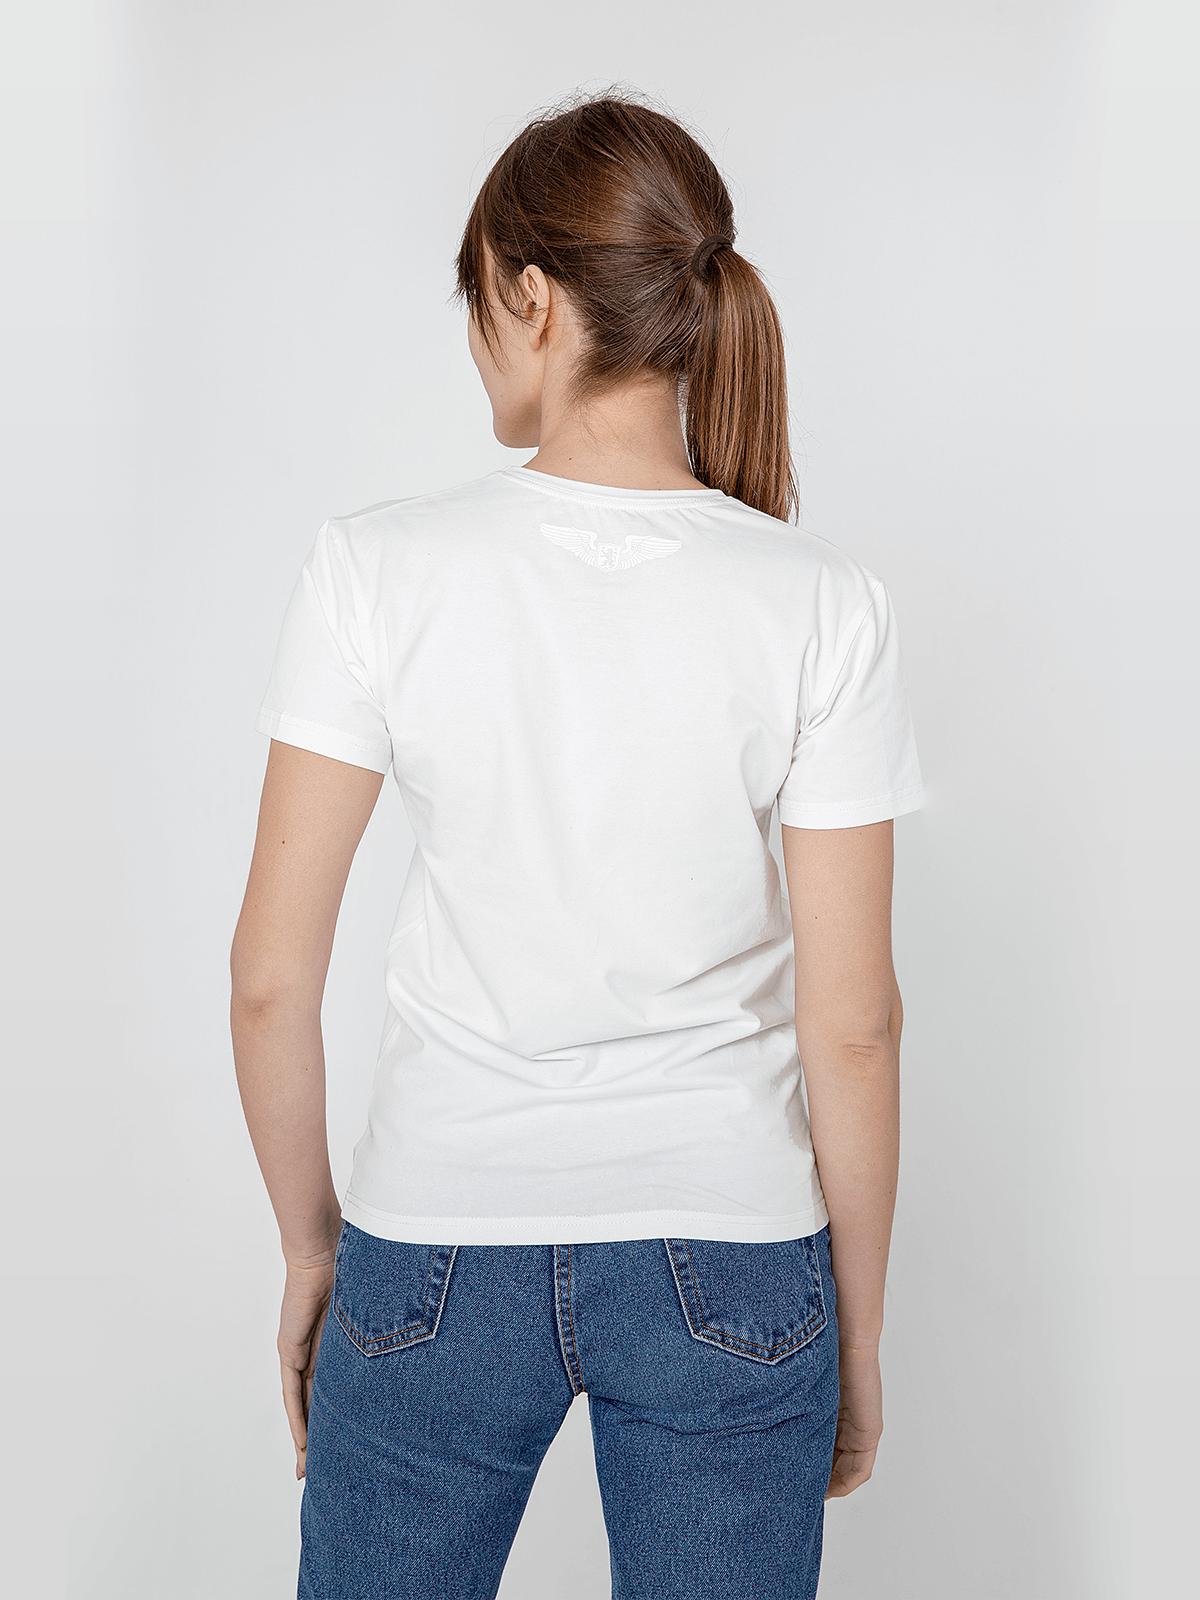 Women's T-Shirt Flu. Color off-white.  Technique of prints applied: silkscreen printing.